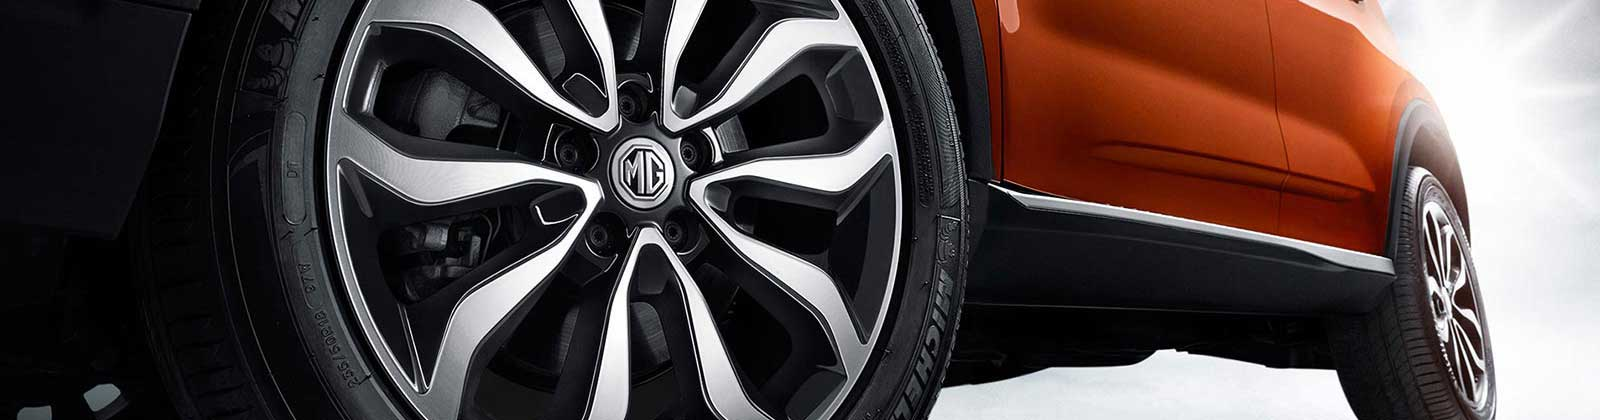 MG GS SUV alloy wheels